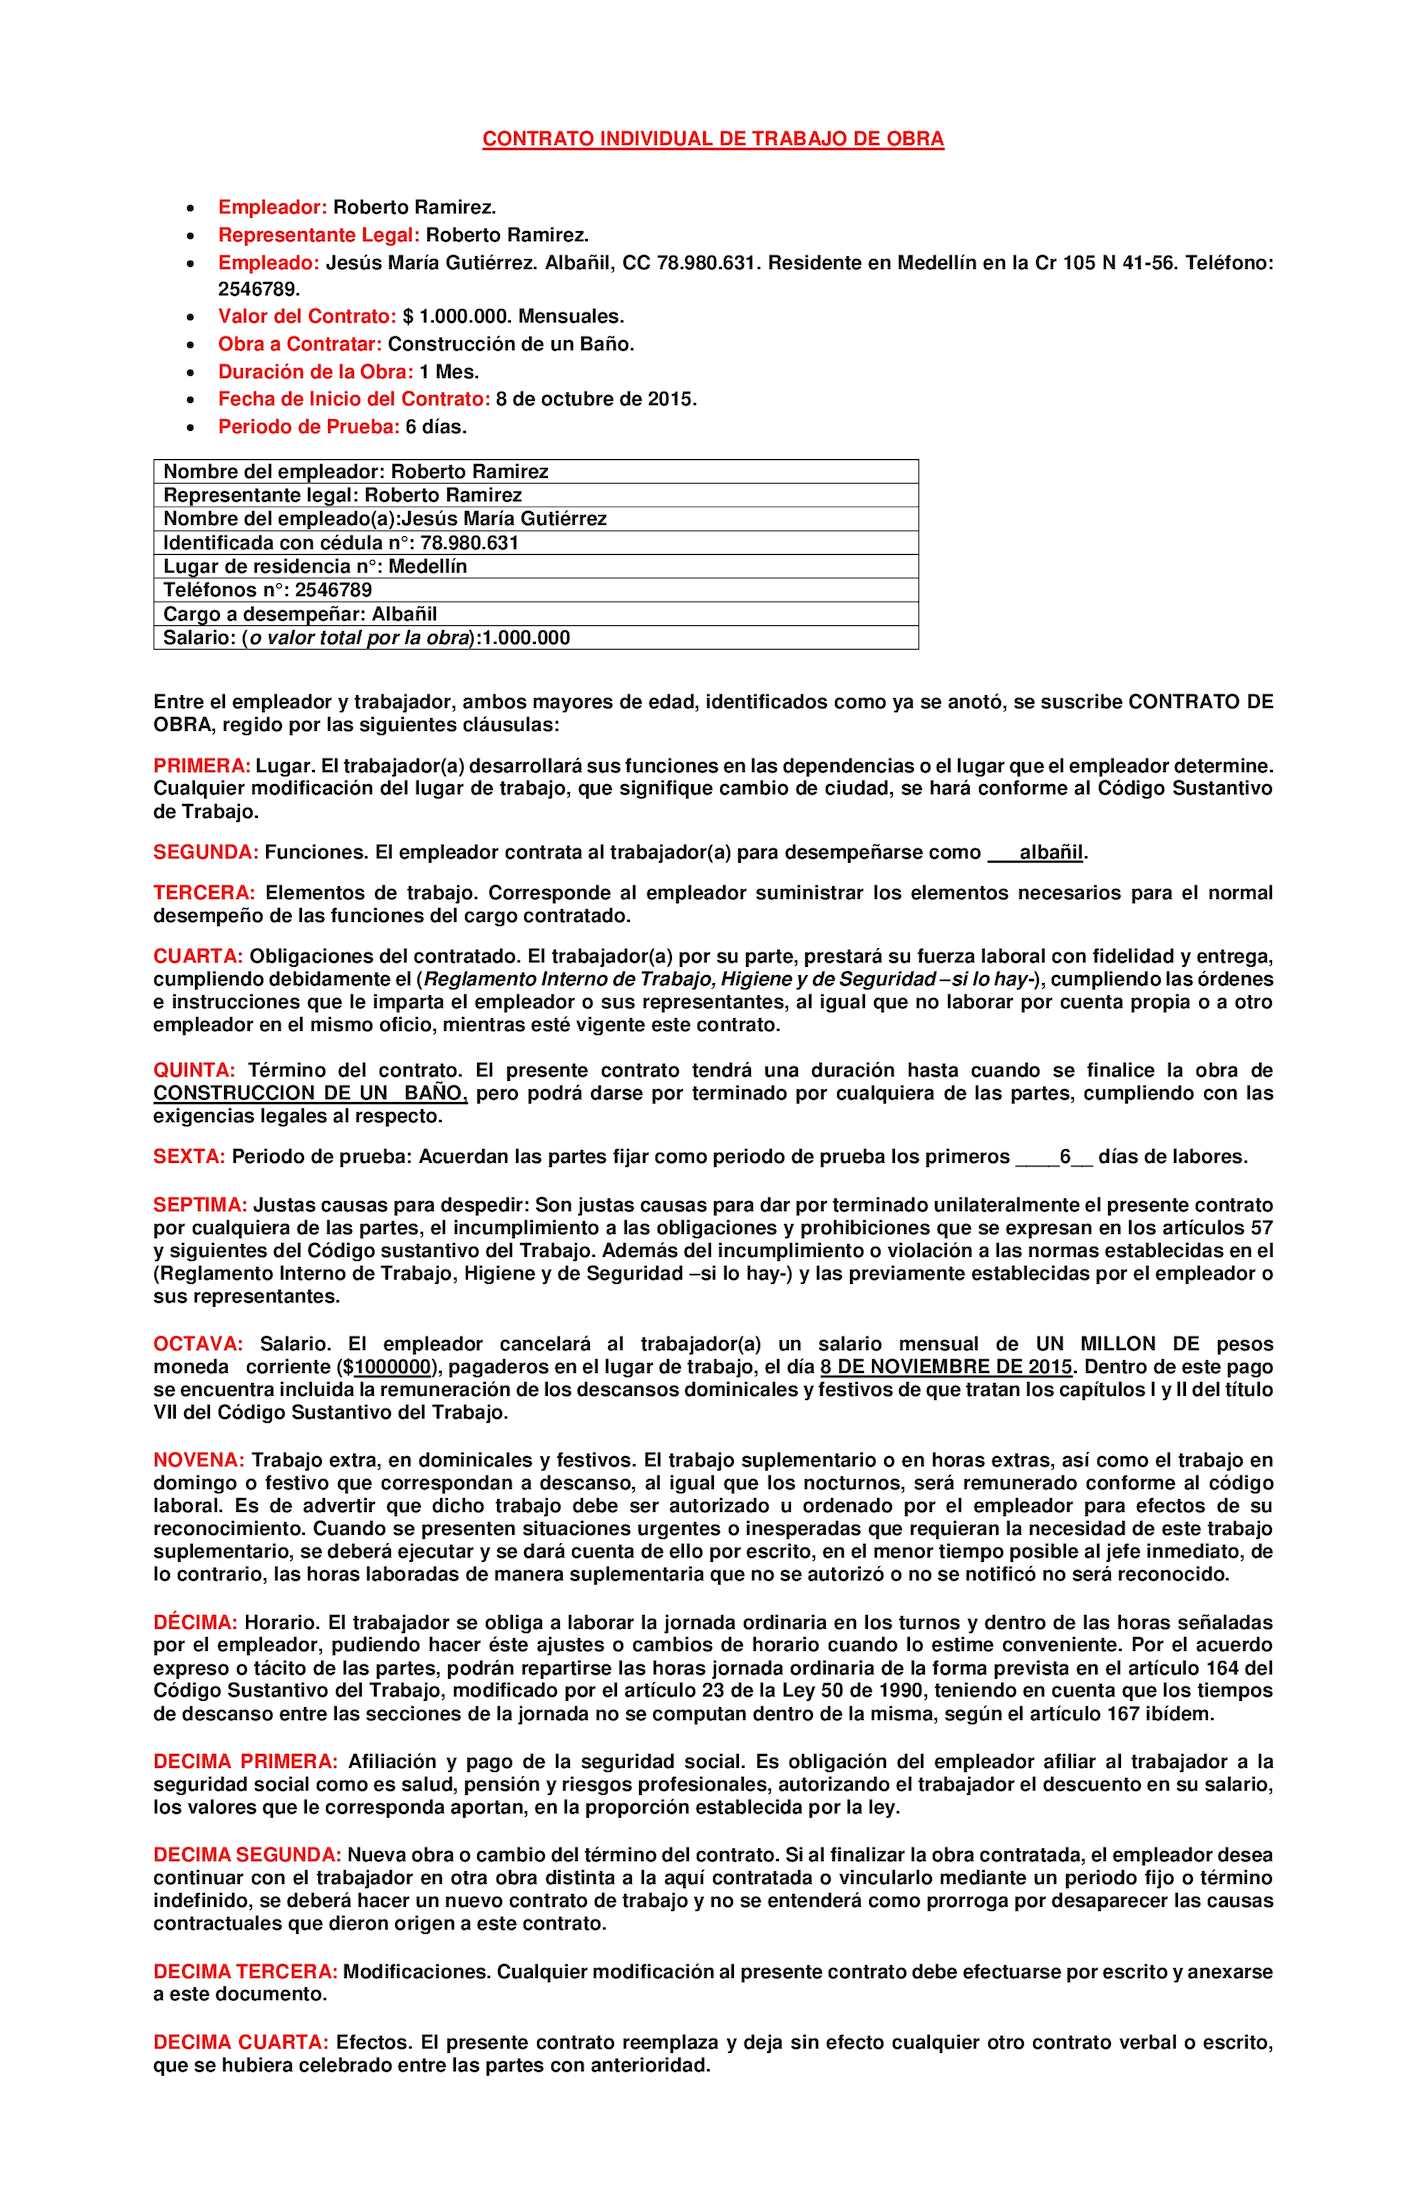 Calameo Contrato Individual De Trabajo De Obra Completo